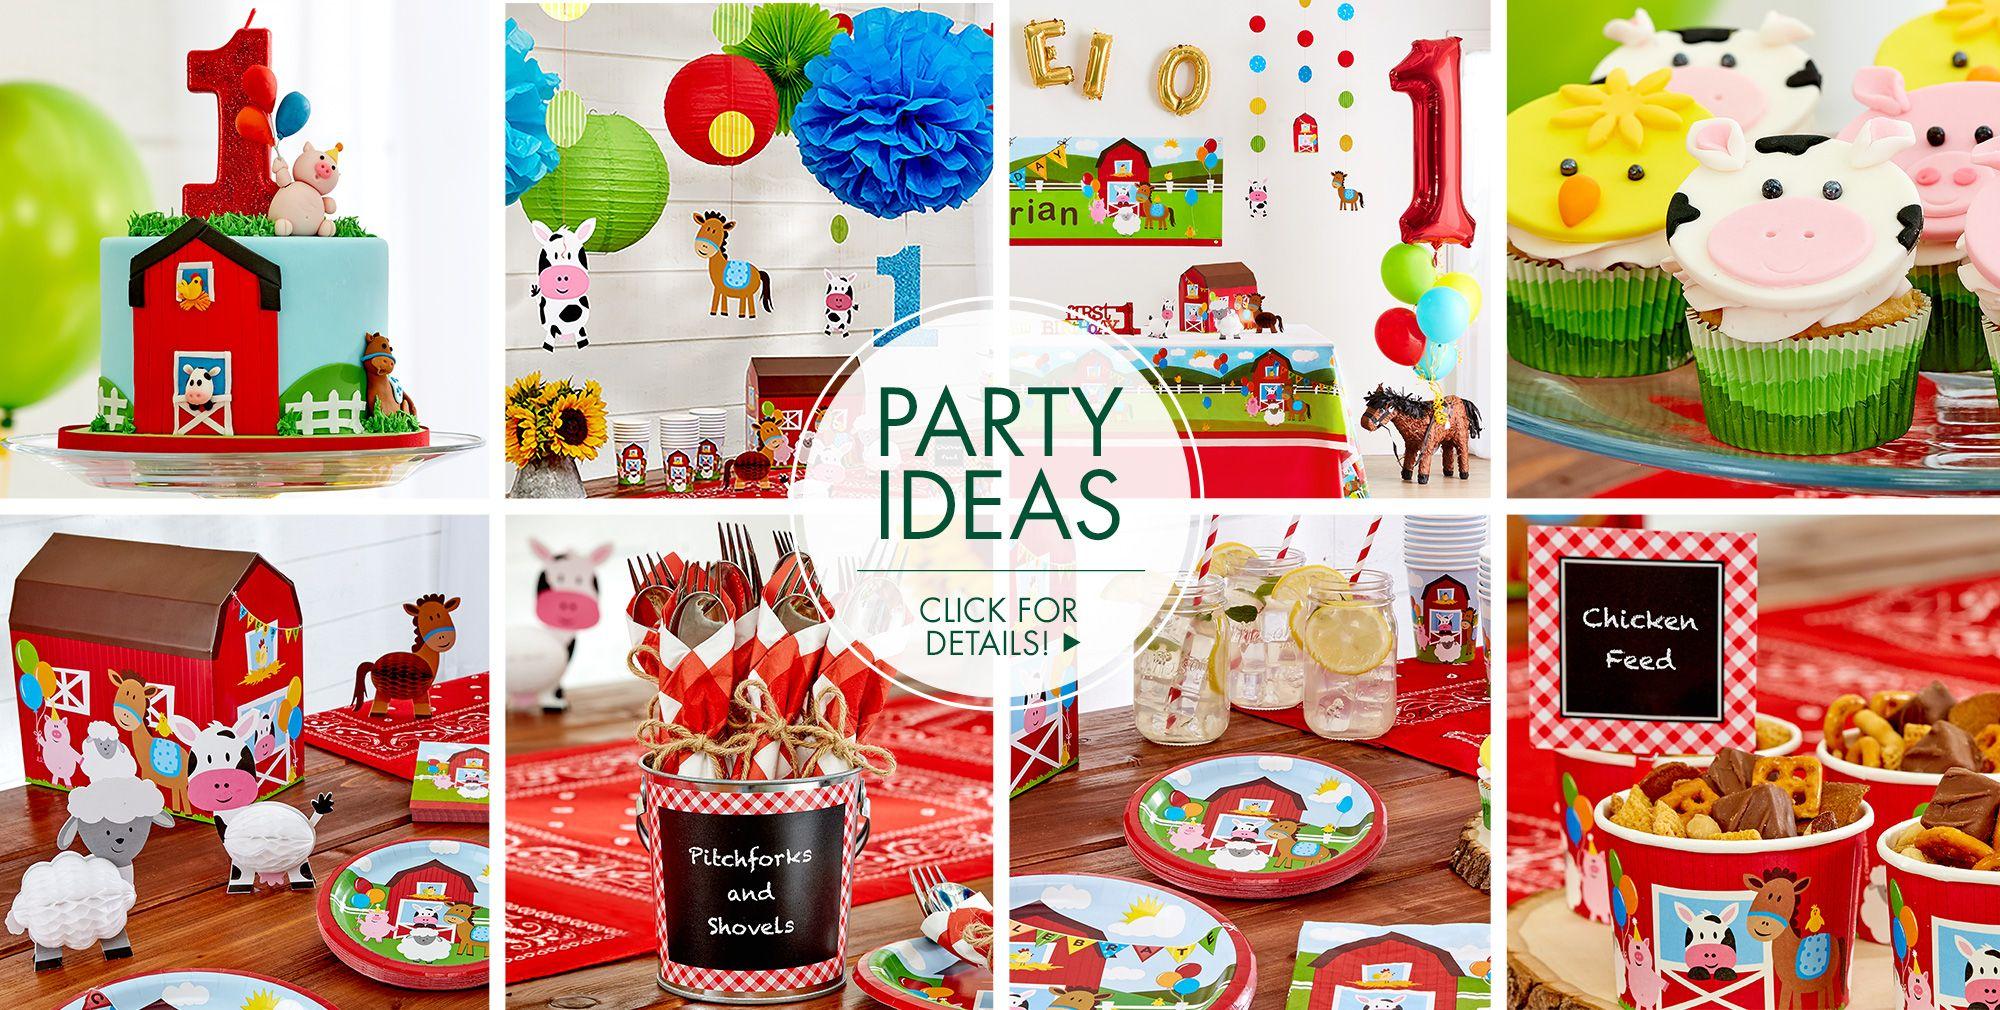 Farmhouse Fun 1st Birthday Party Supplies Birthday Decorations